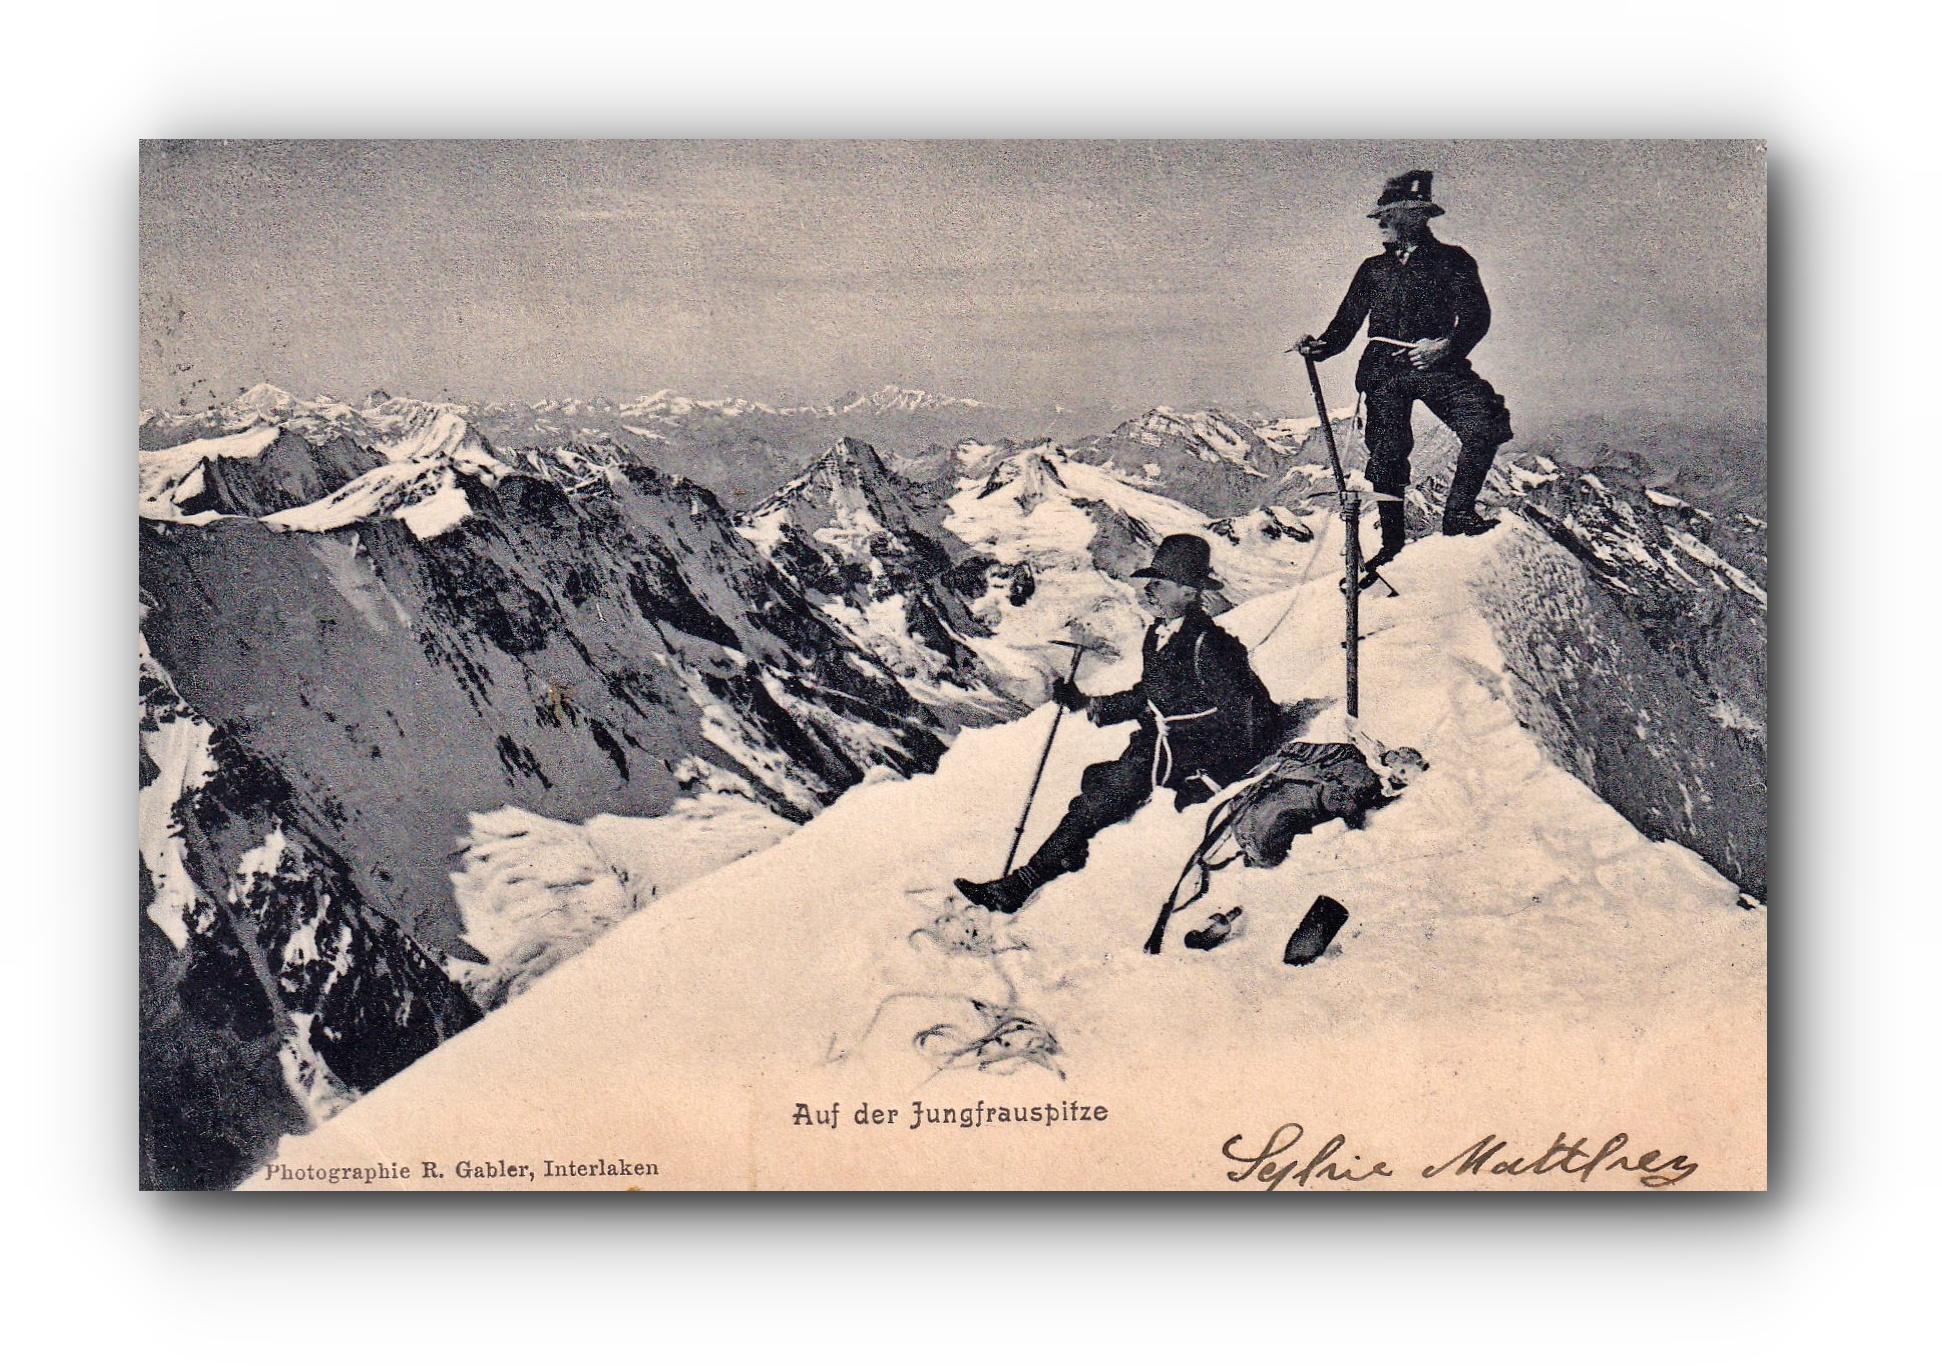 Auf der Jungfrauspitze - 28.07.1905 - Au sommet de la Jungfrau - On the Jungfrau Peak